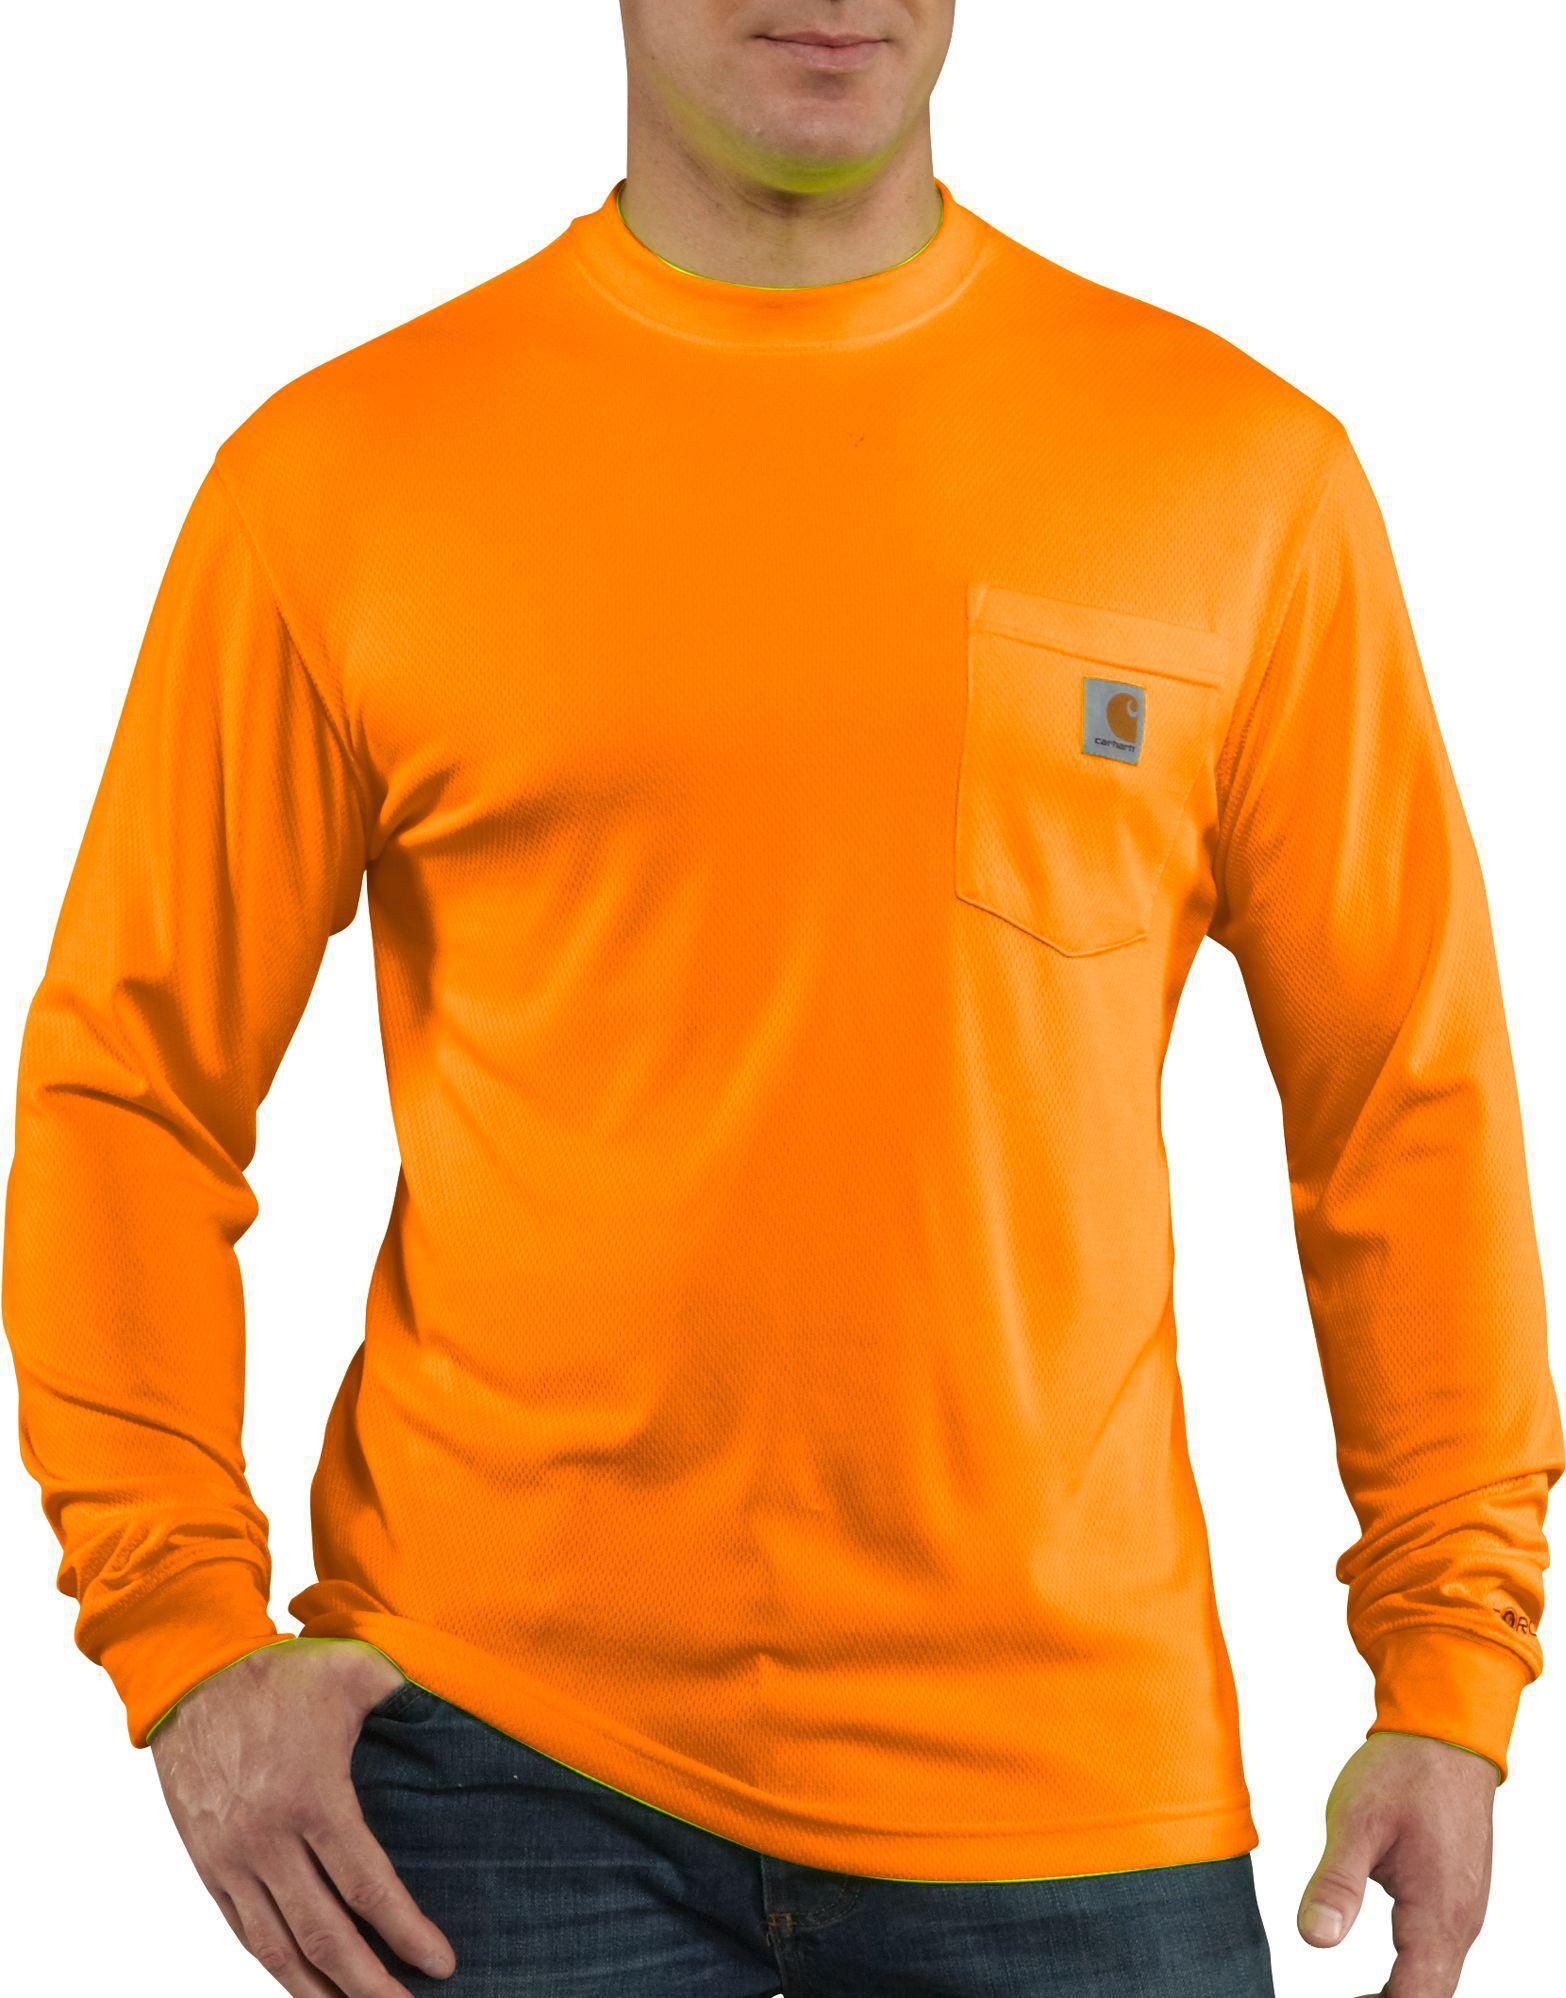 5575c5091 Lyst - Carhartt Force Color Enhanced Long Sleeve Shirt in Orange for ...